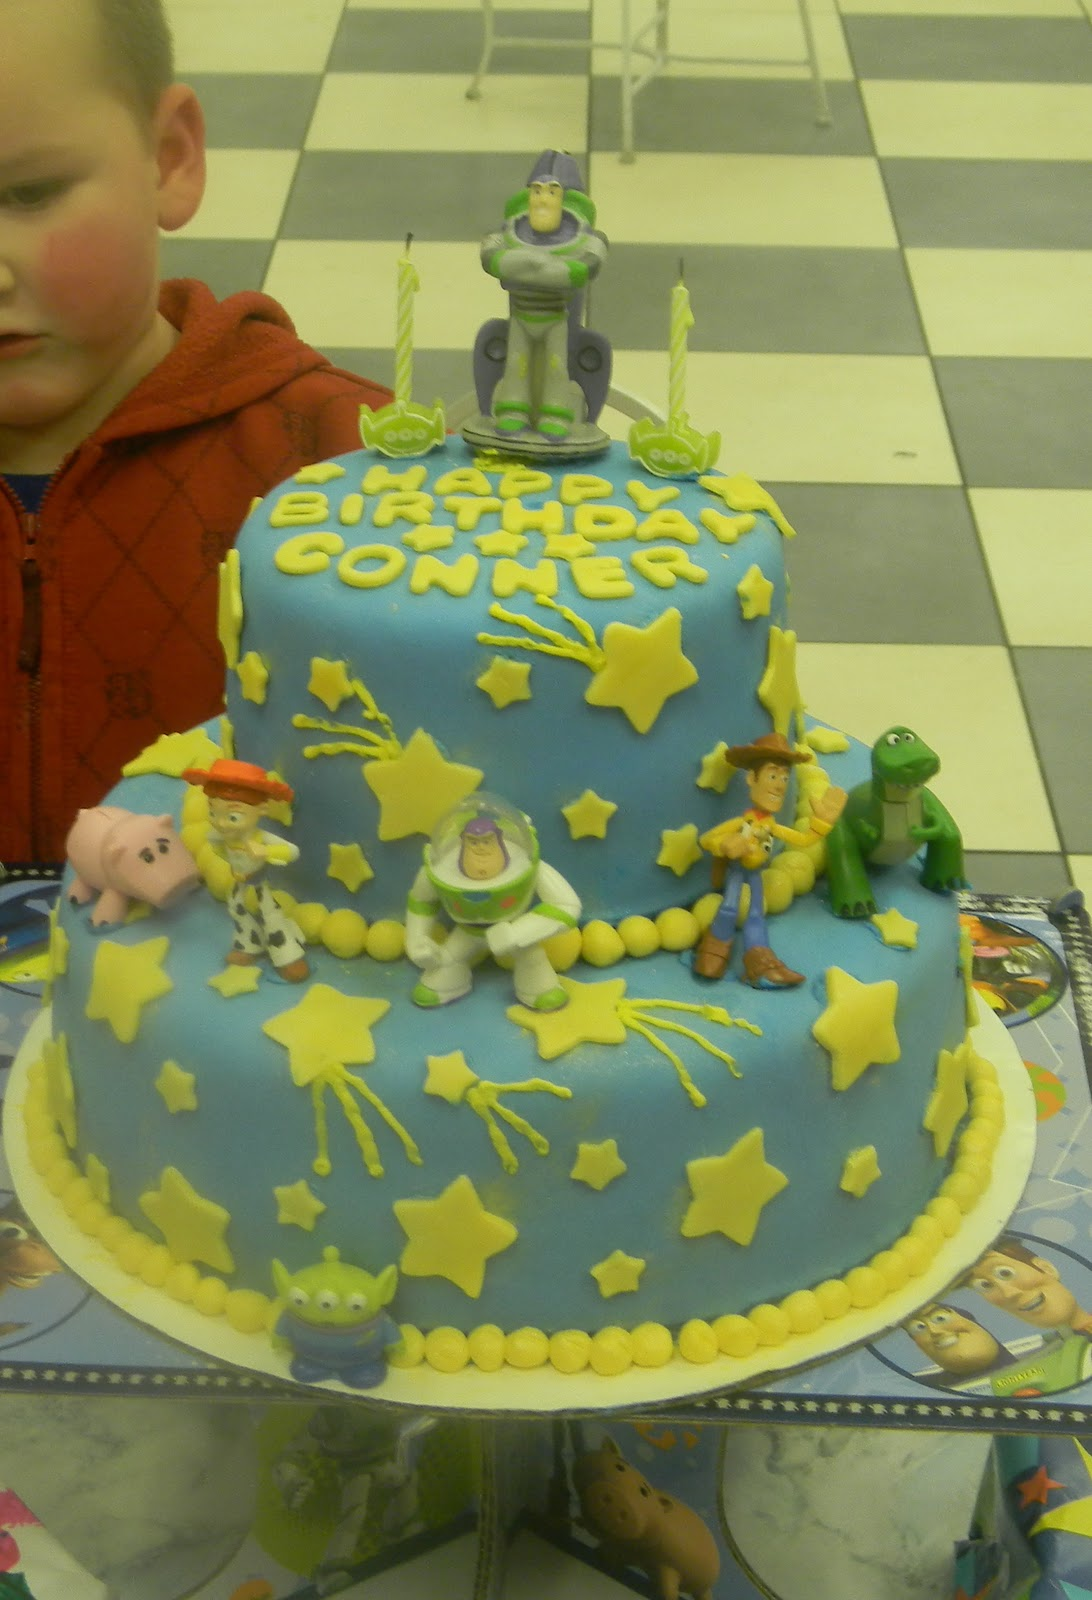 Buzz Lightyear Cake Mold